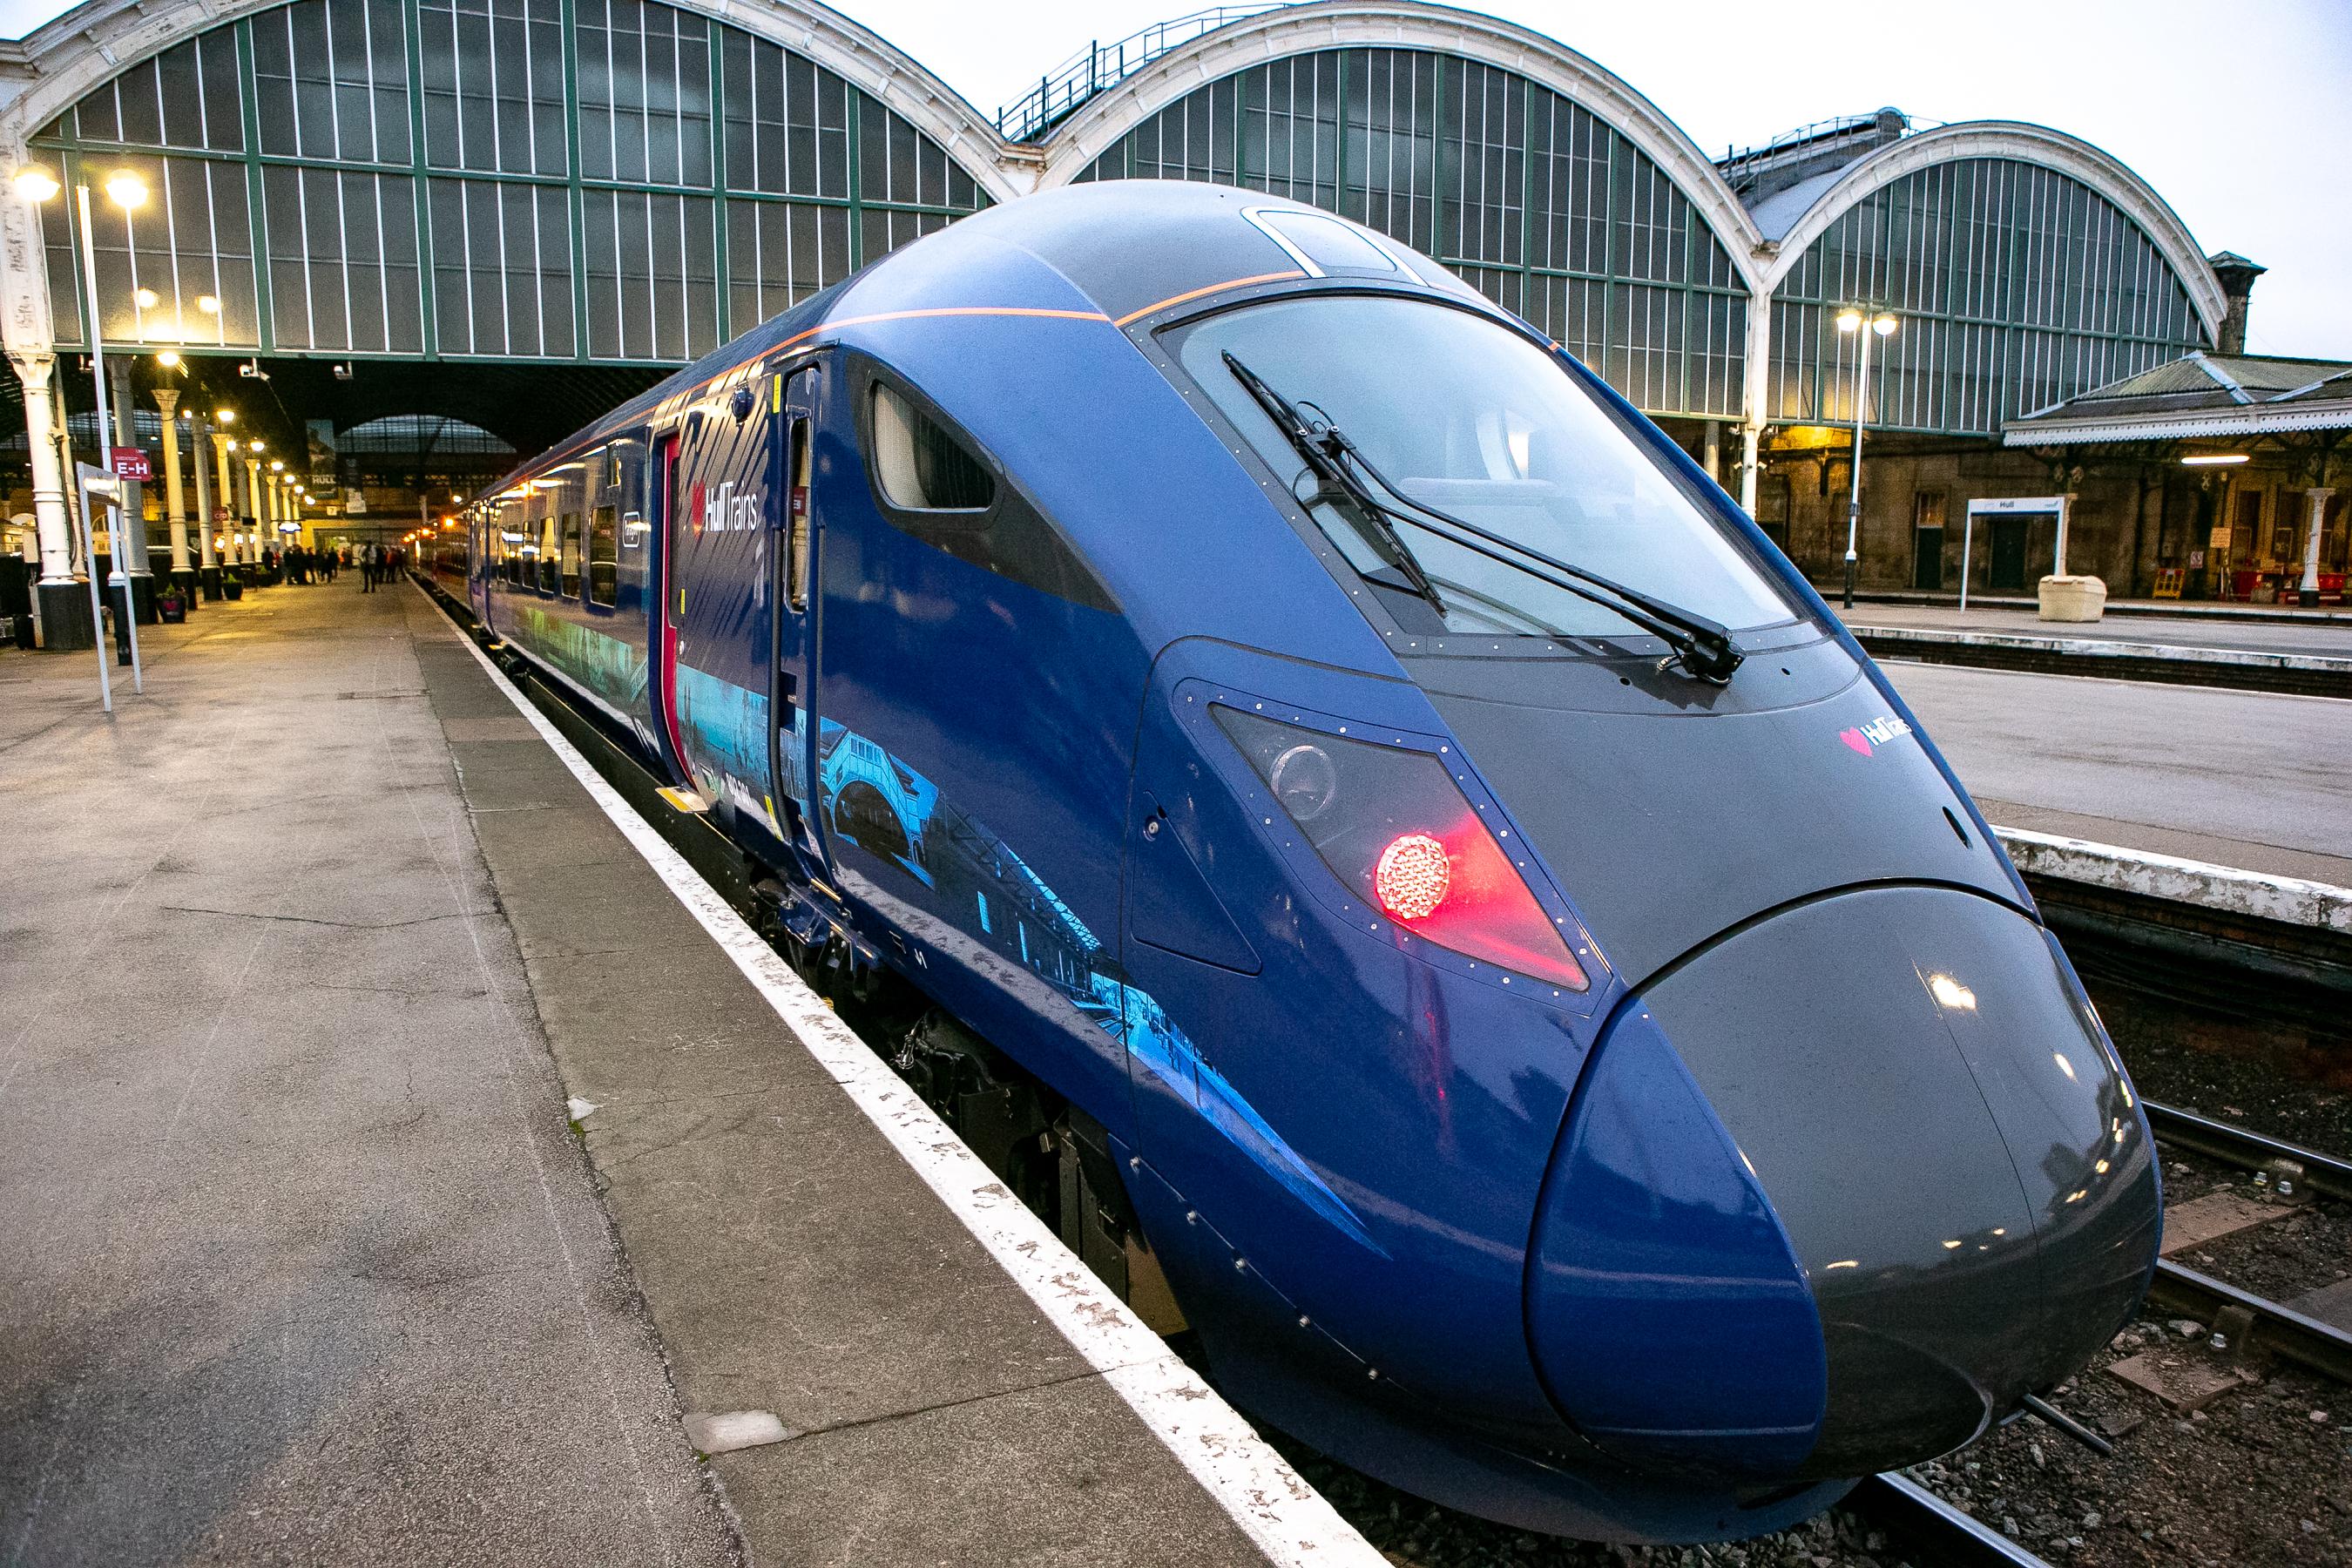 Class 802 Hitachi Paragon for Hull Trains